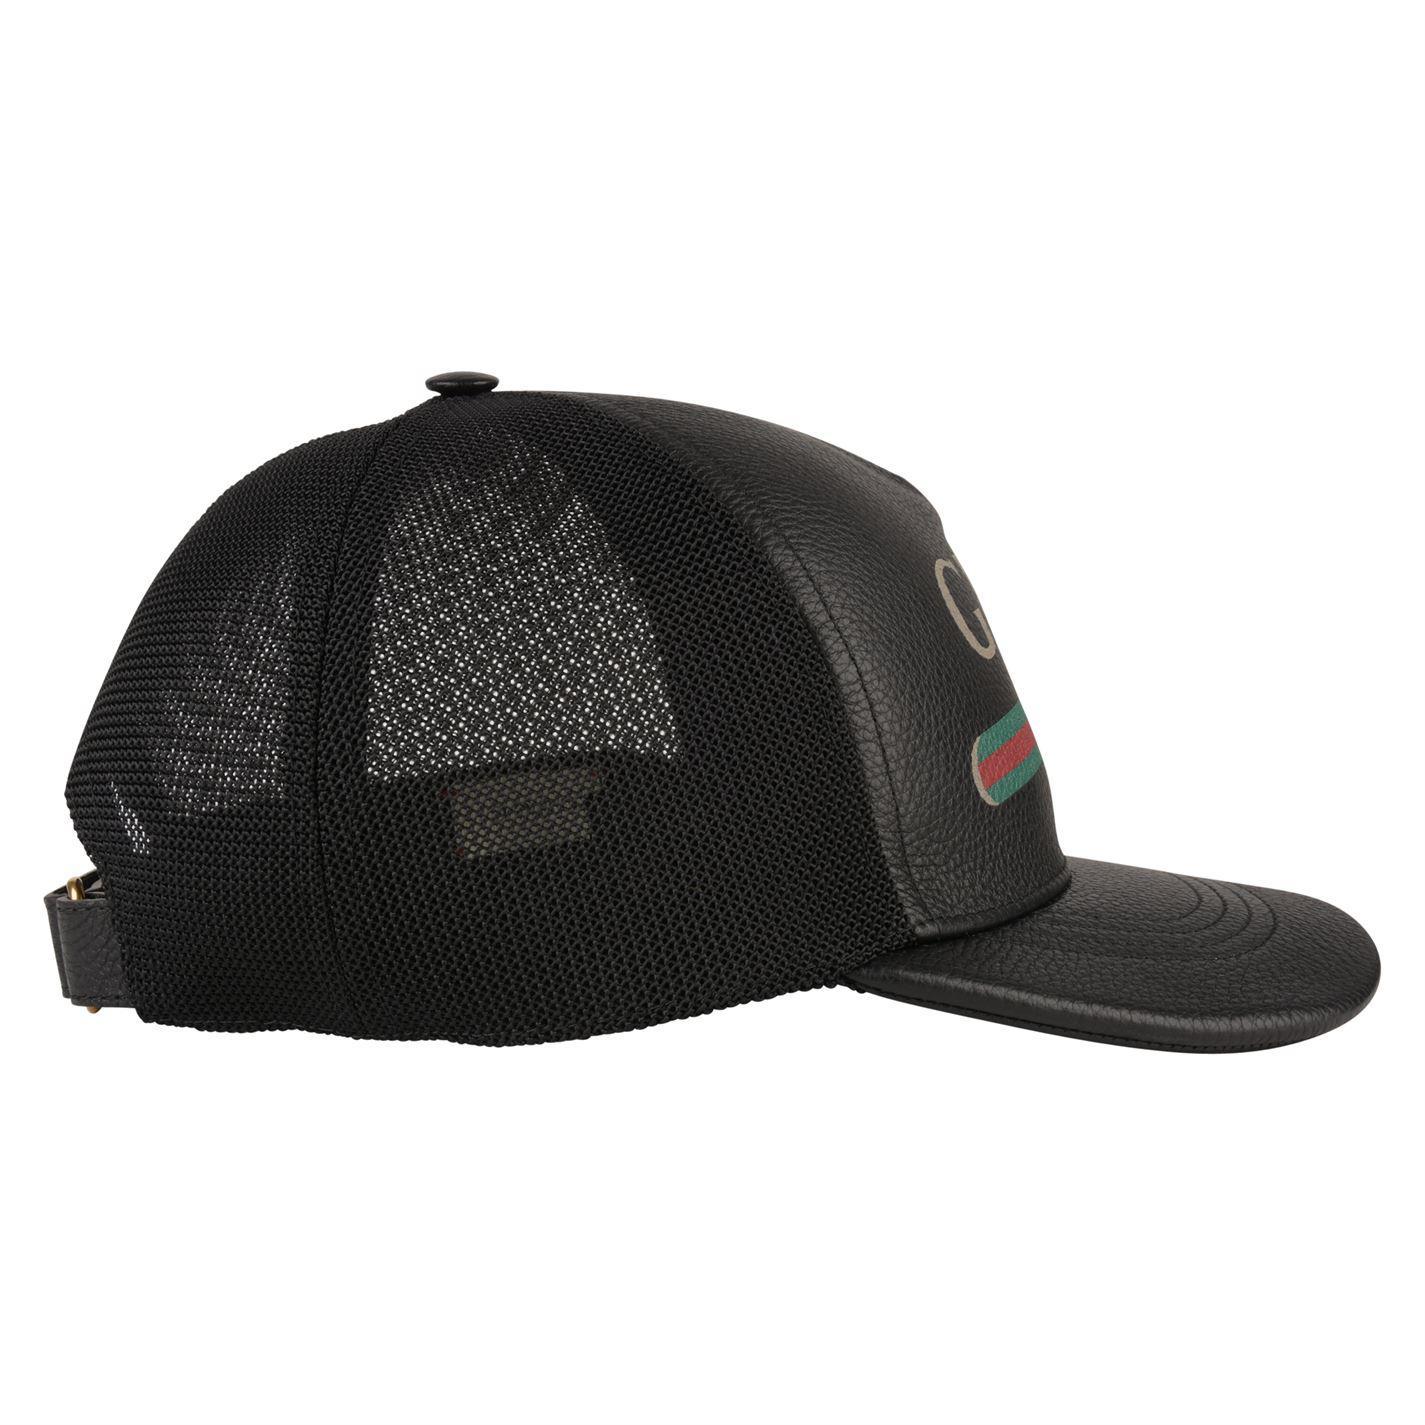 7e4f9675b1c Gucci - Black Logo-print Leather And Mesh Baseball Cap for Men - Lyst. View  fullscreen